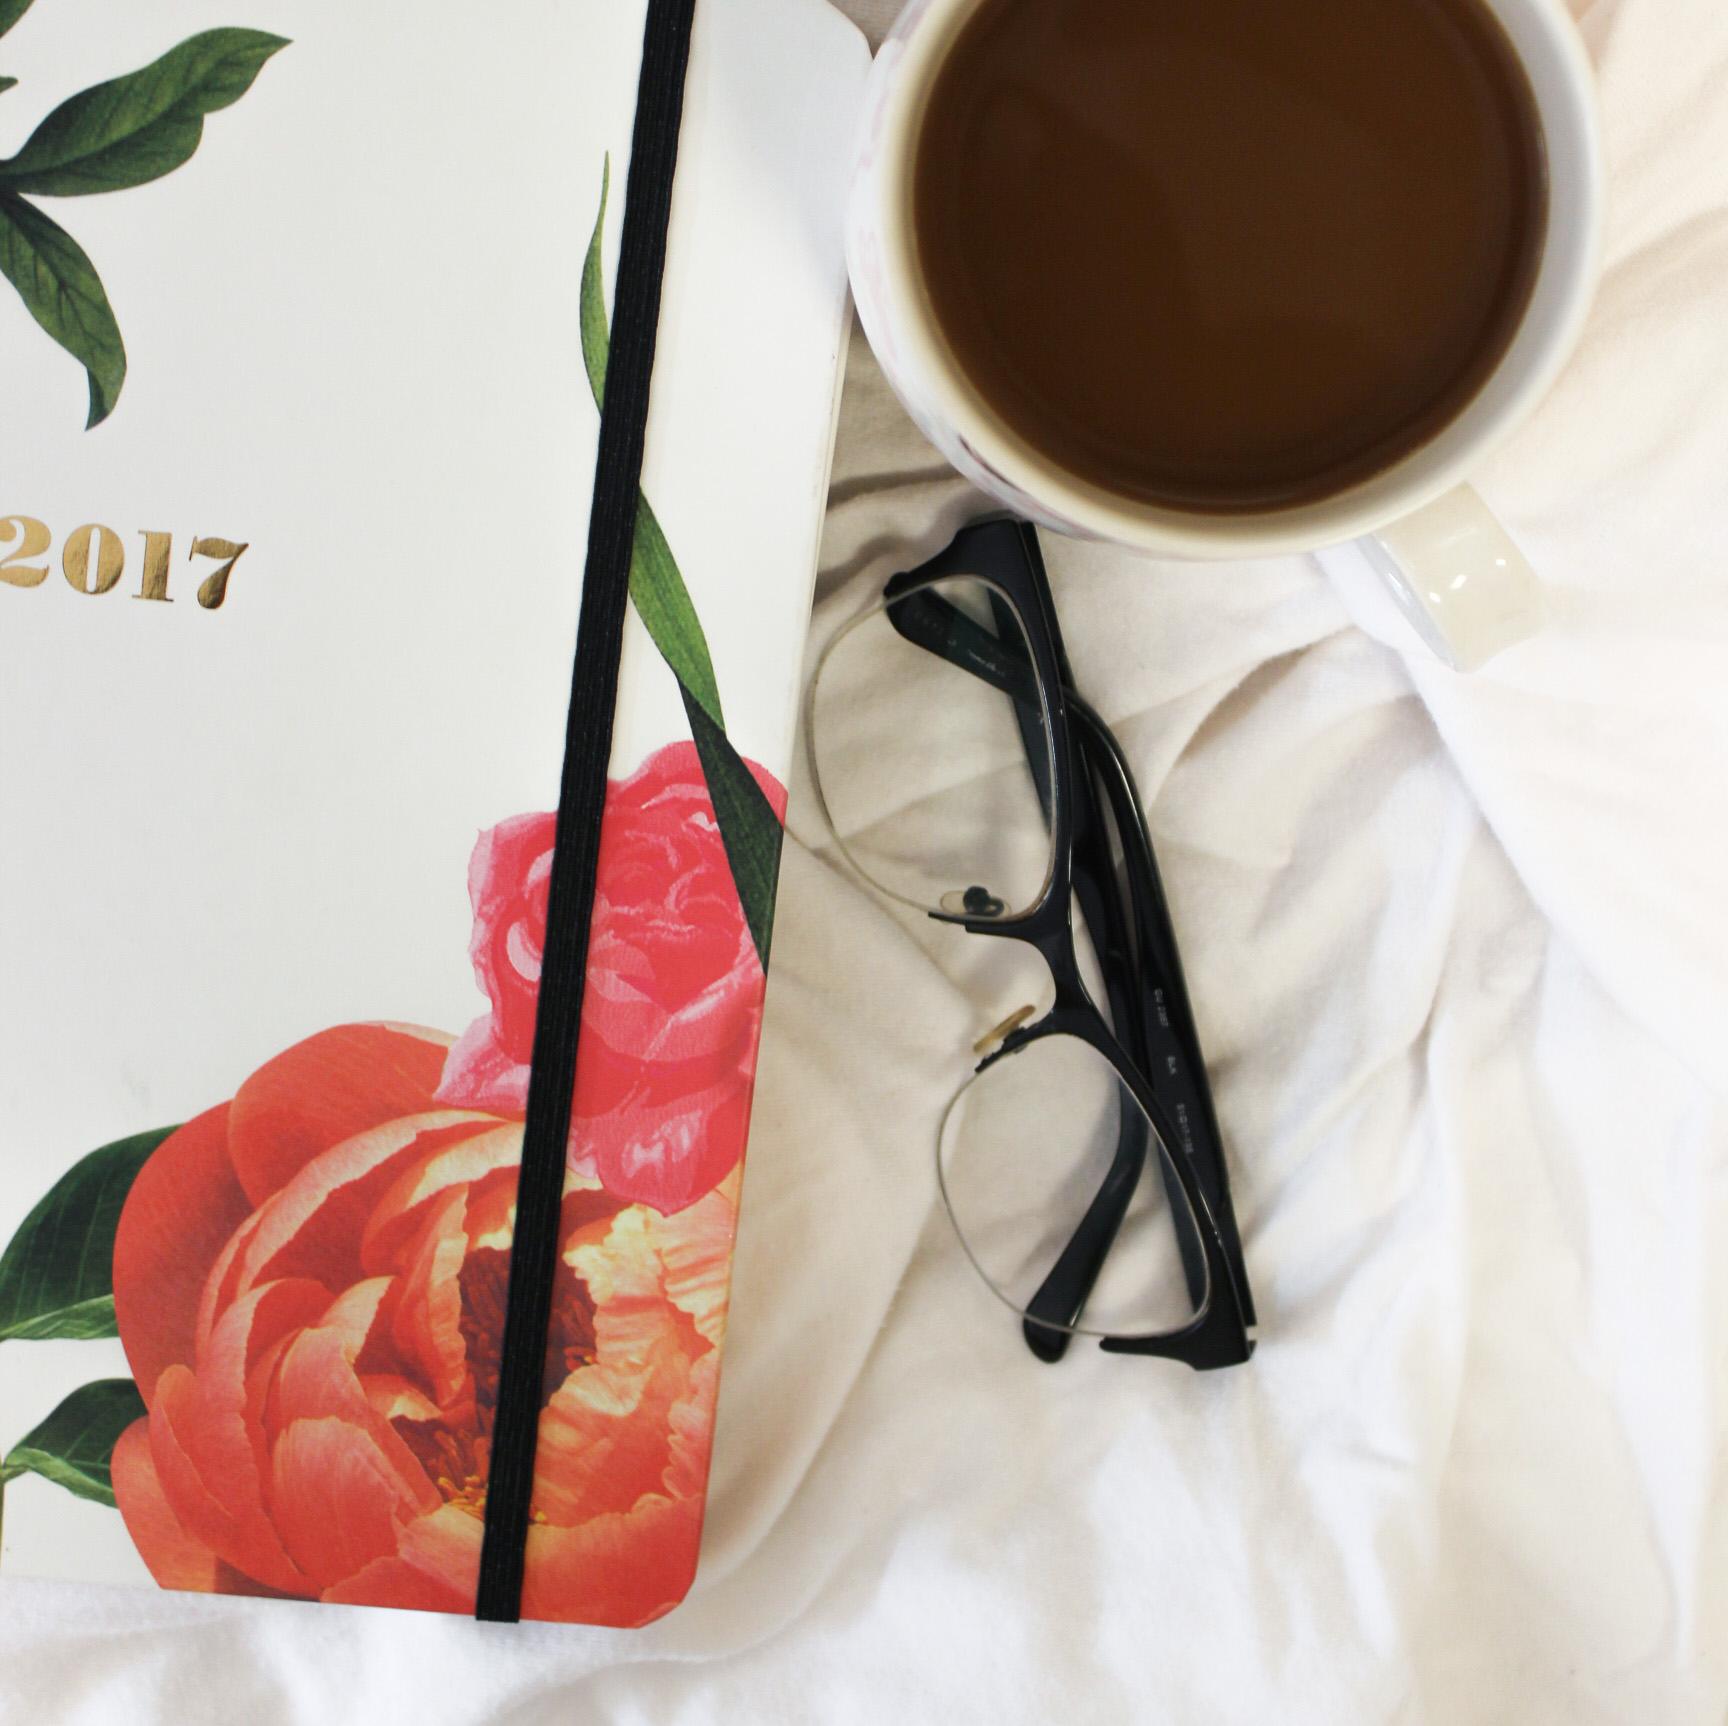 Sunday Coffee - Southern New Yorker - Audra Koch